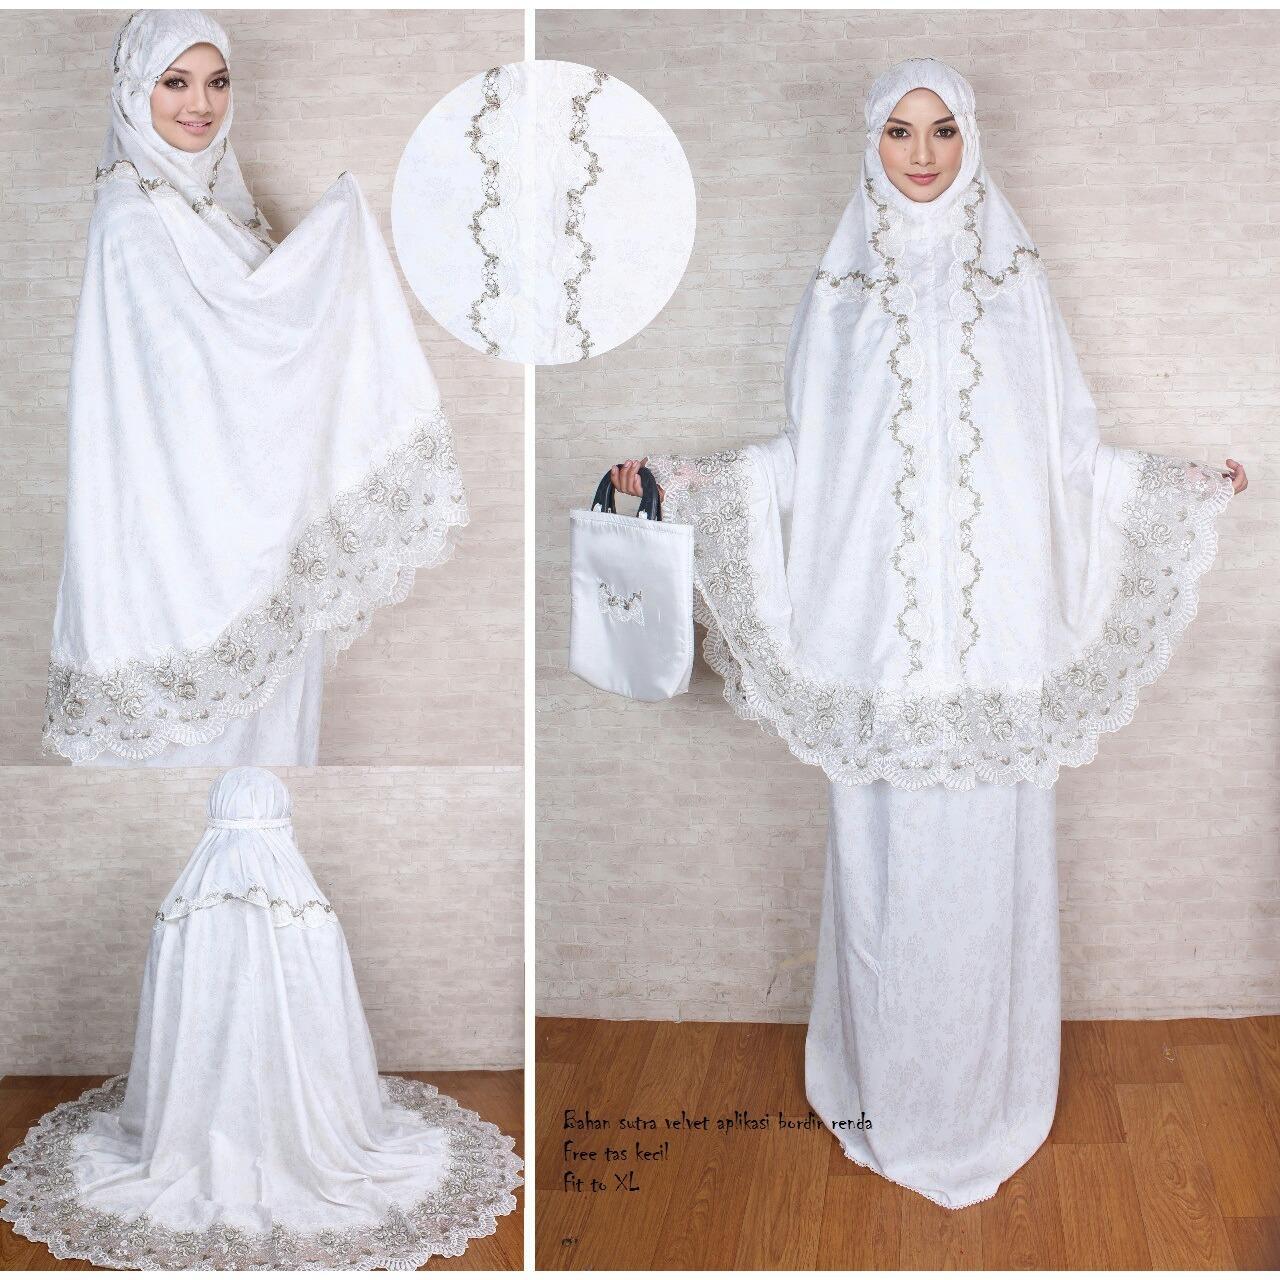 Ukhuwah Mukena Naziha Abu Daftar Harga Terkini Dan Terlengkap Bordir Homemade Hafsyah Putih Premierfashionstore Batik Kudus Rojali Aryantin